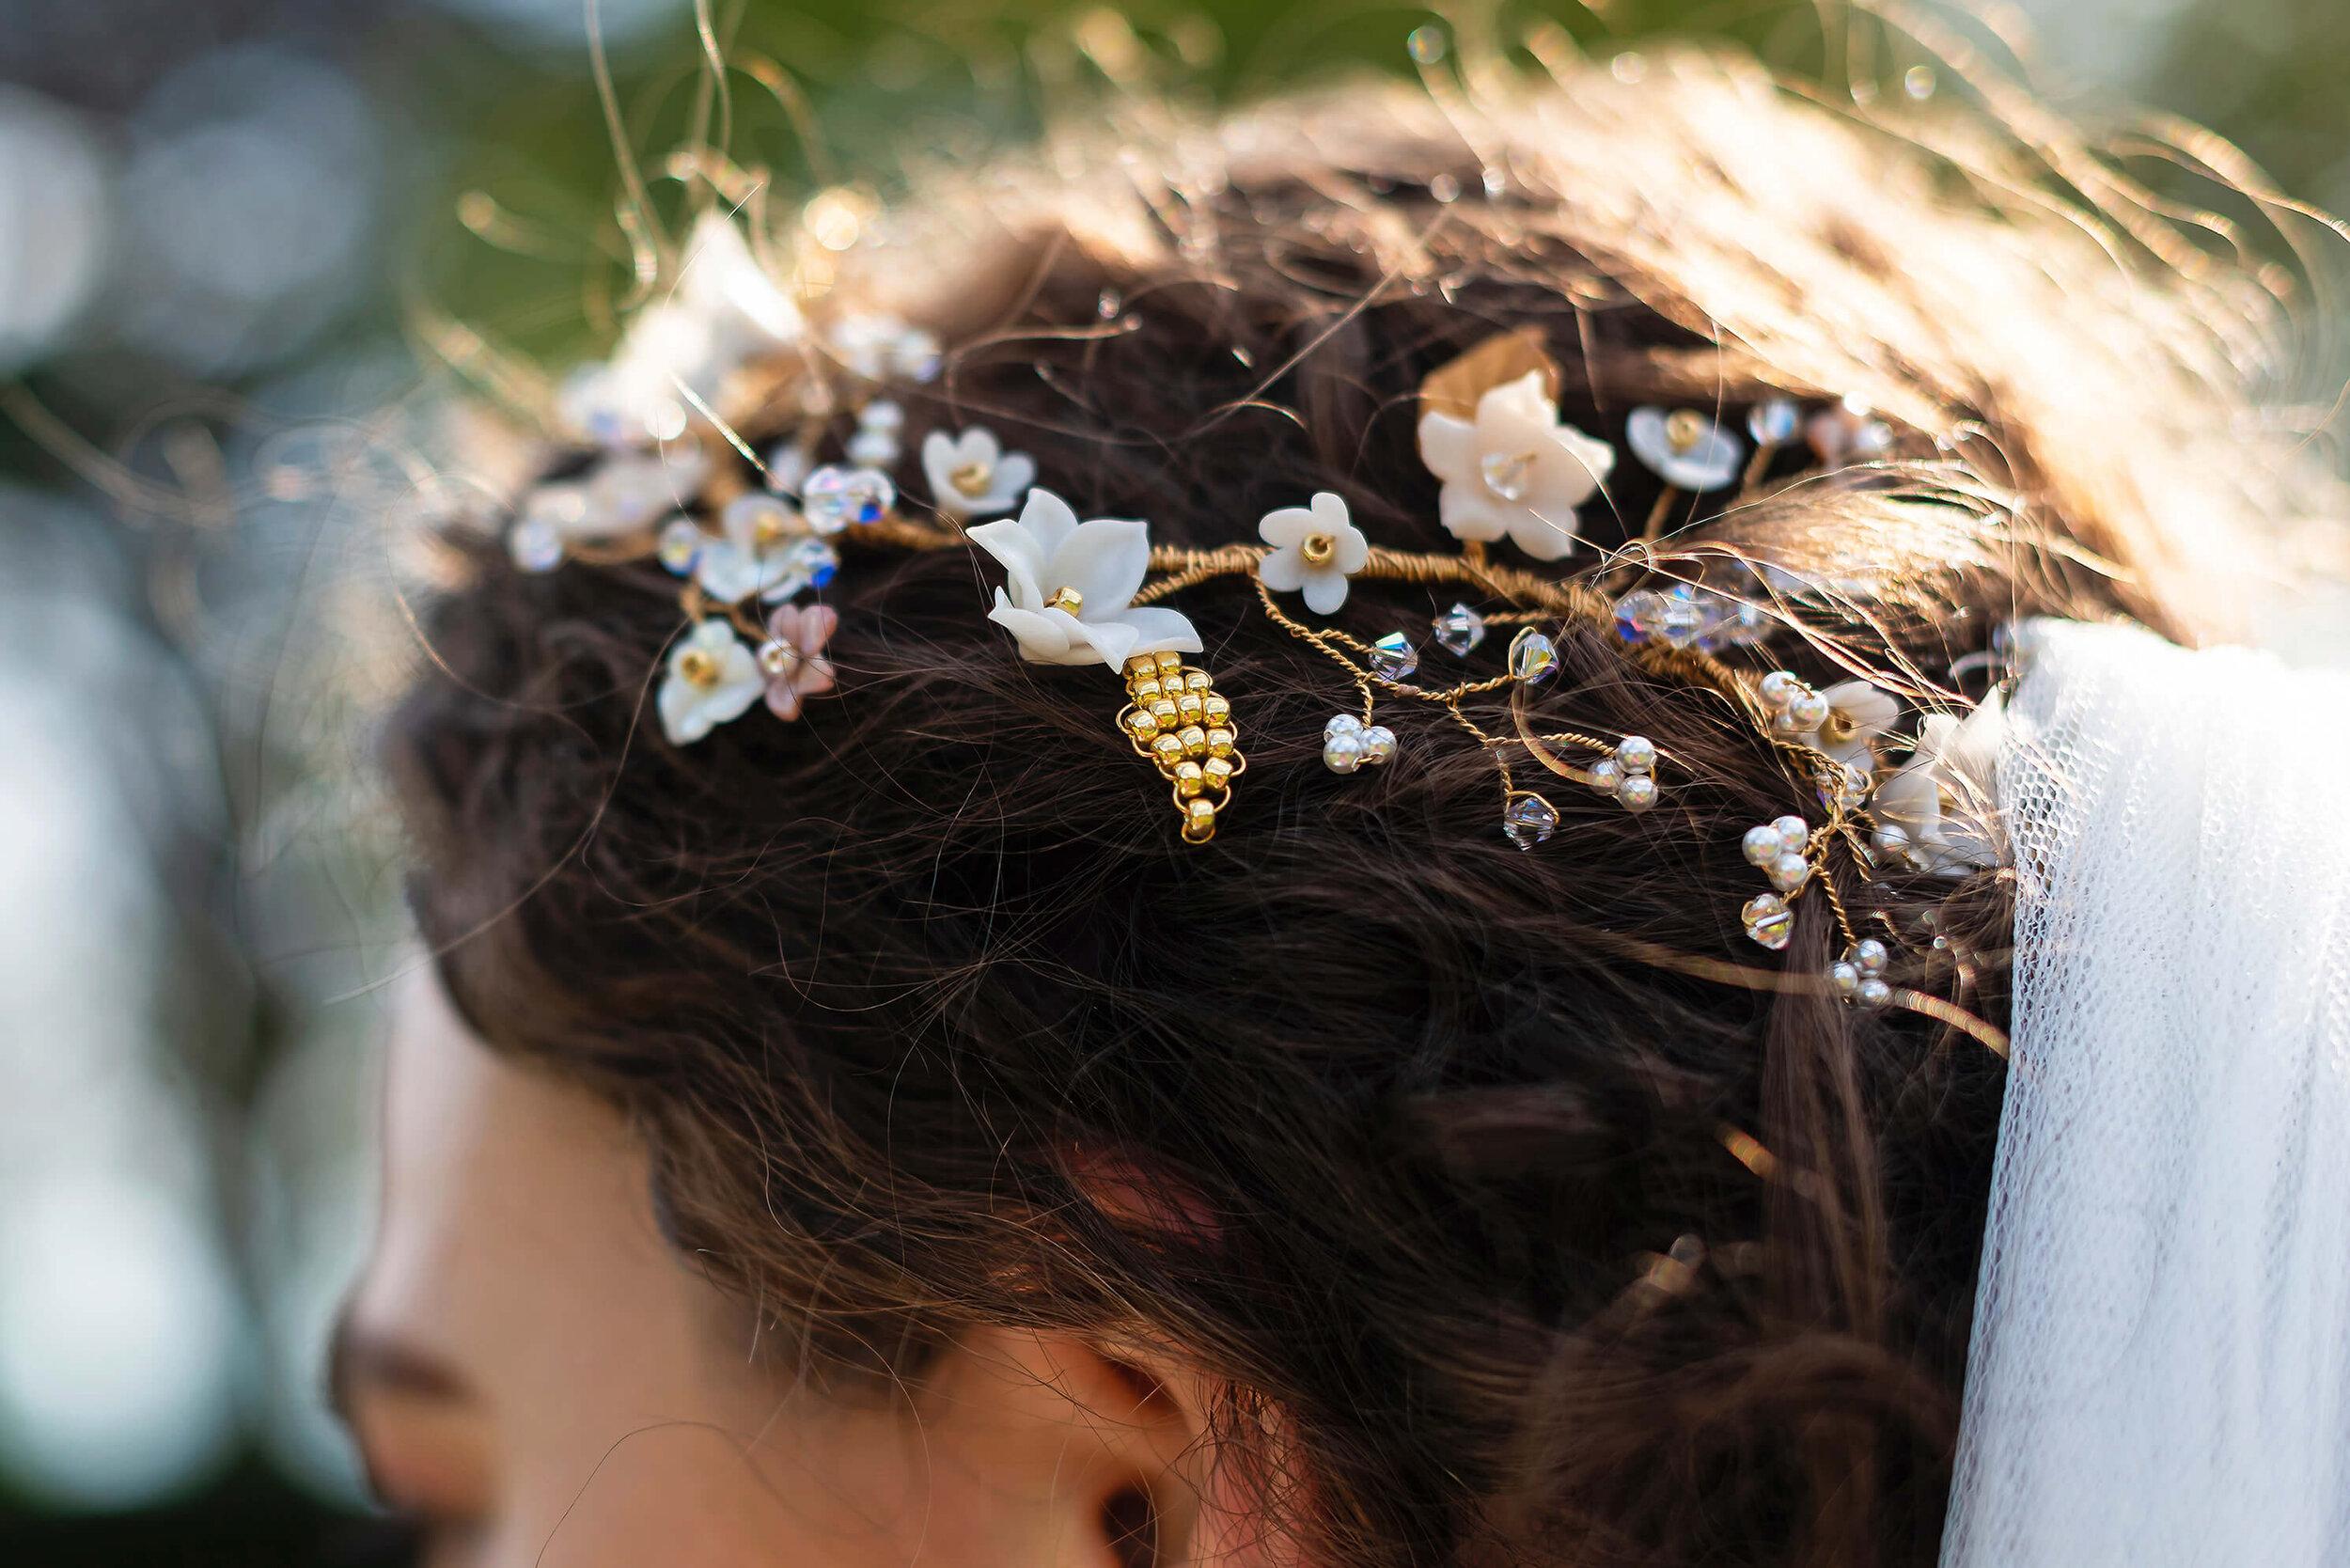 Bride with Sash & Veil Bridal veil, and PS With Love Bridal Hair Piece, at Nurstead Court Wedding Venue, Kent.